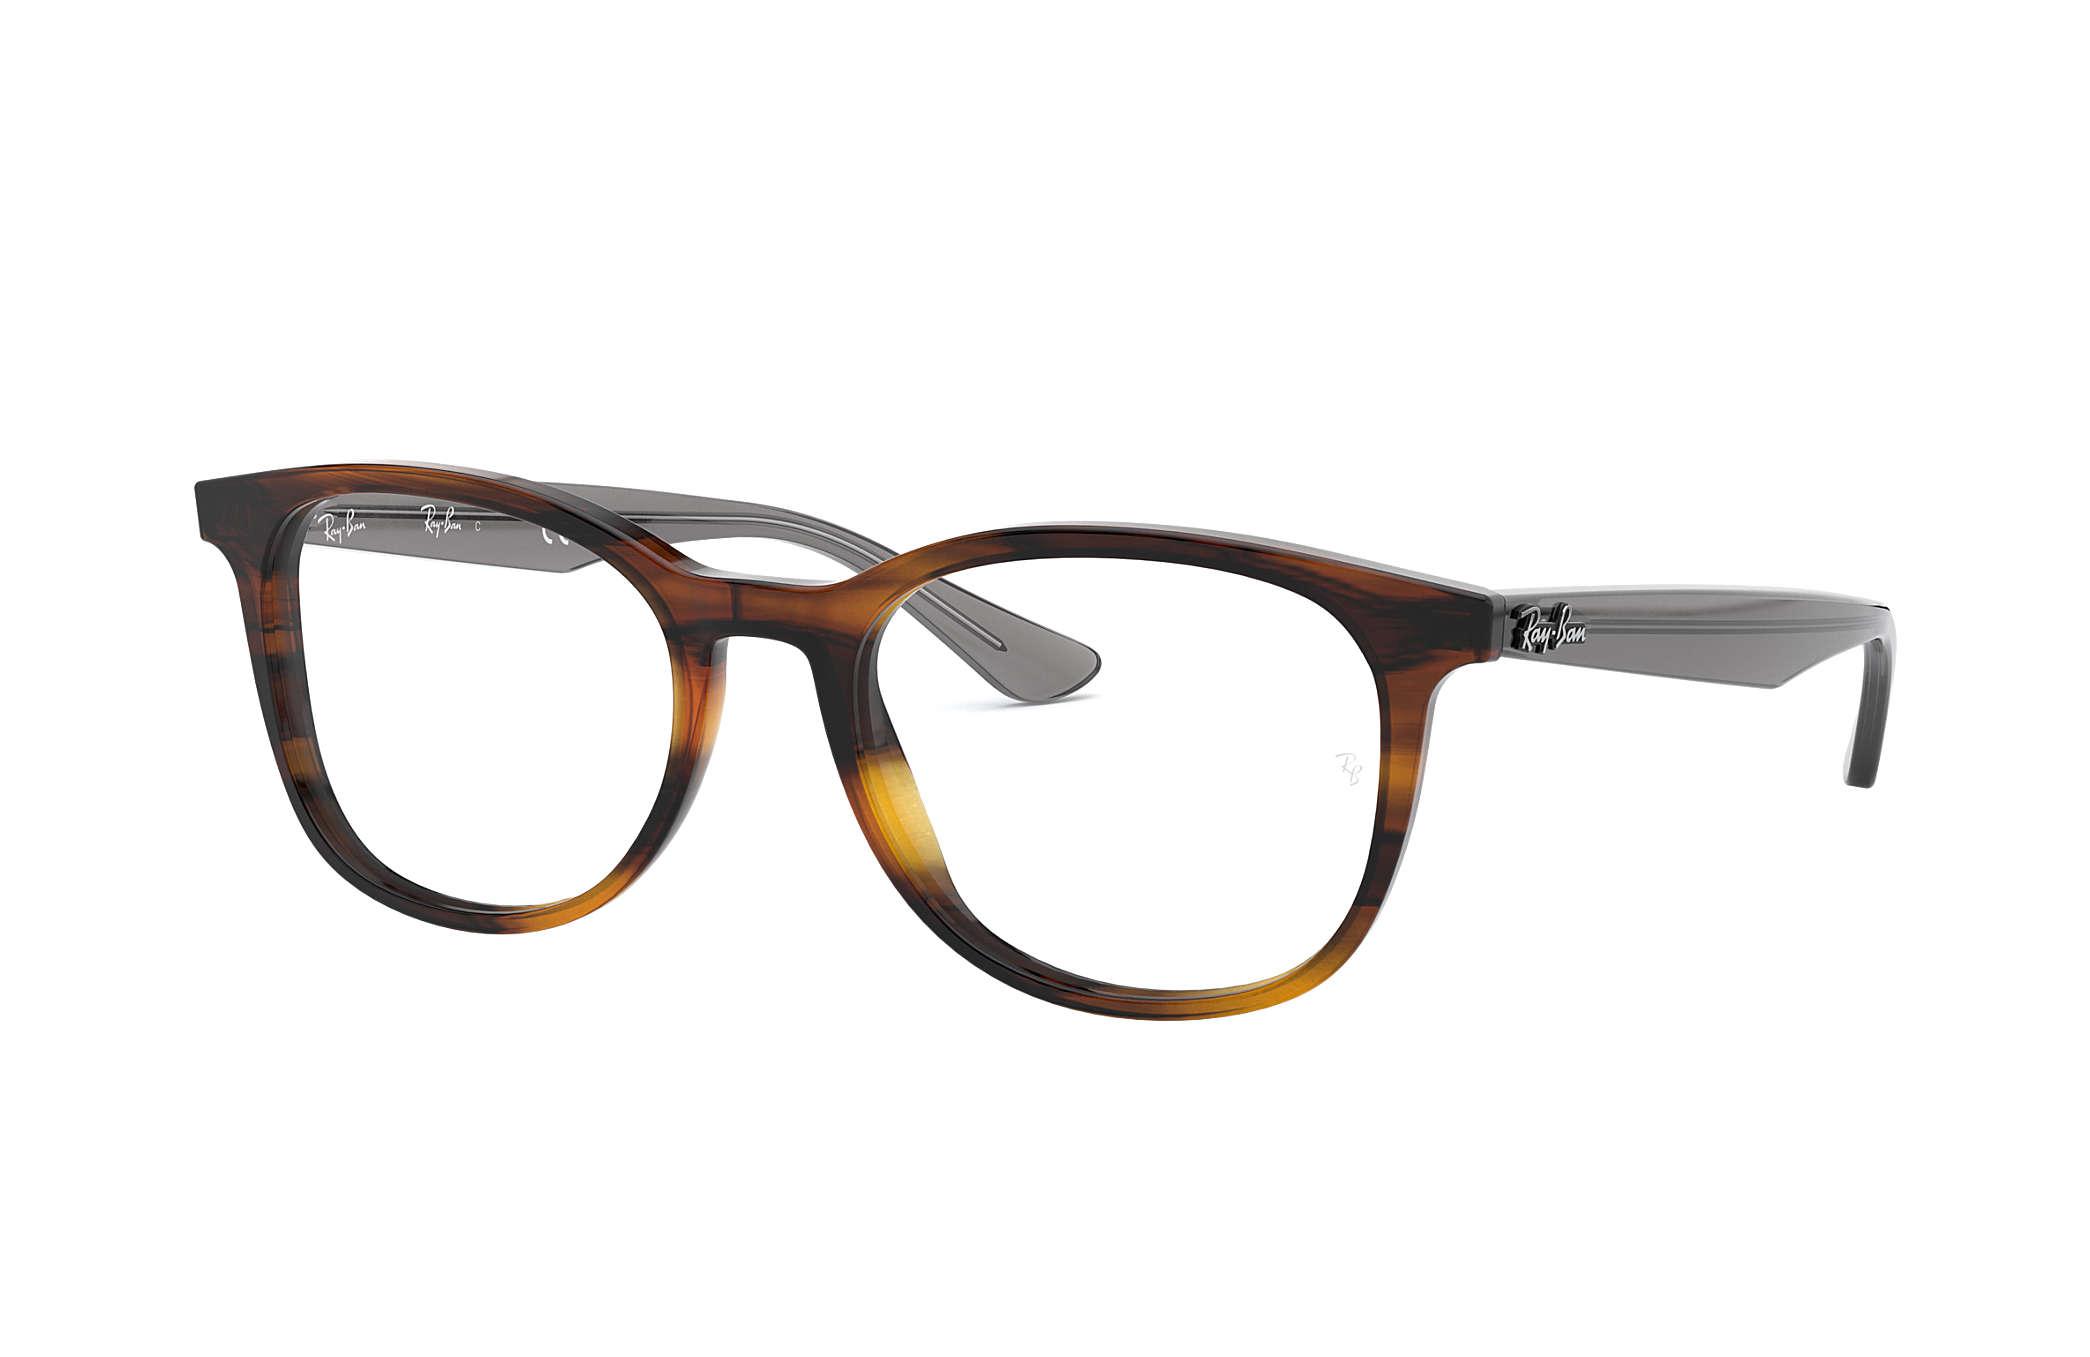 ray ban sehbrille grau